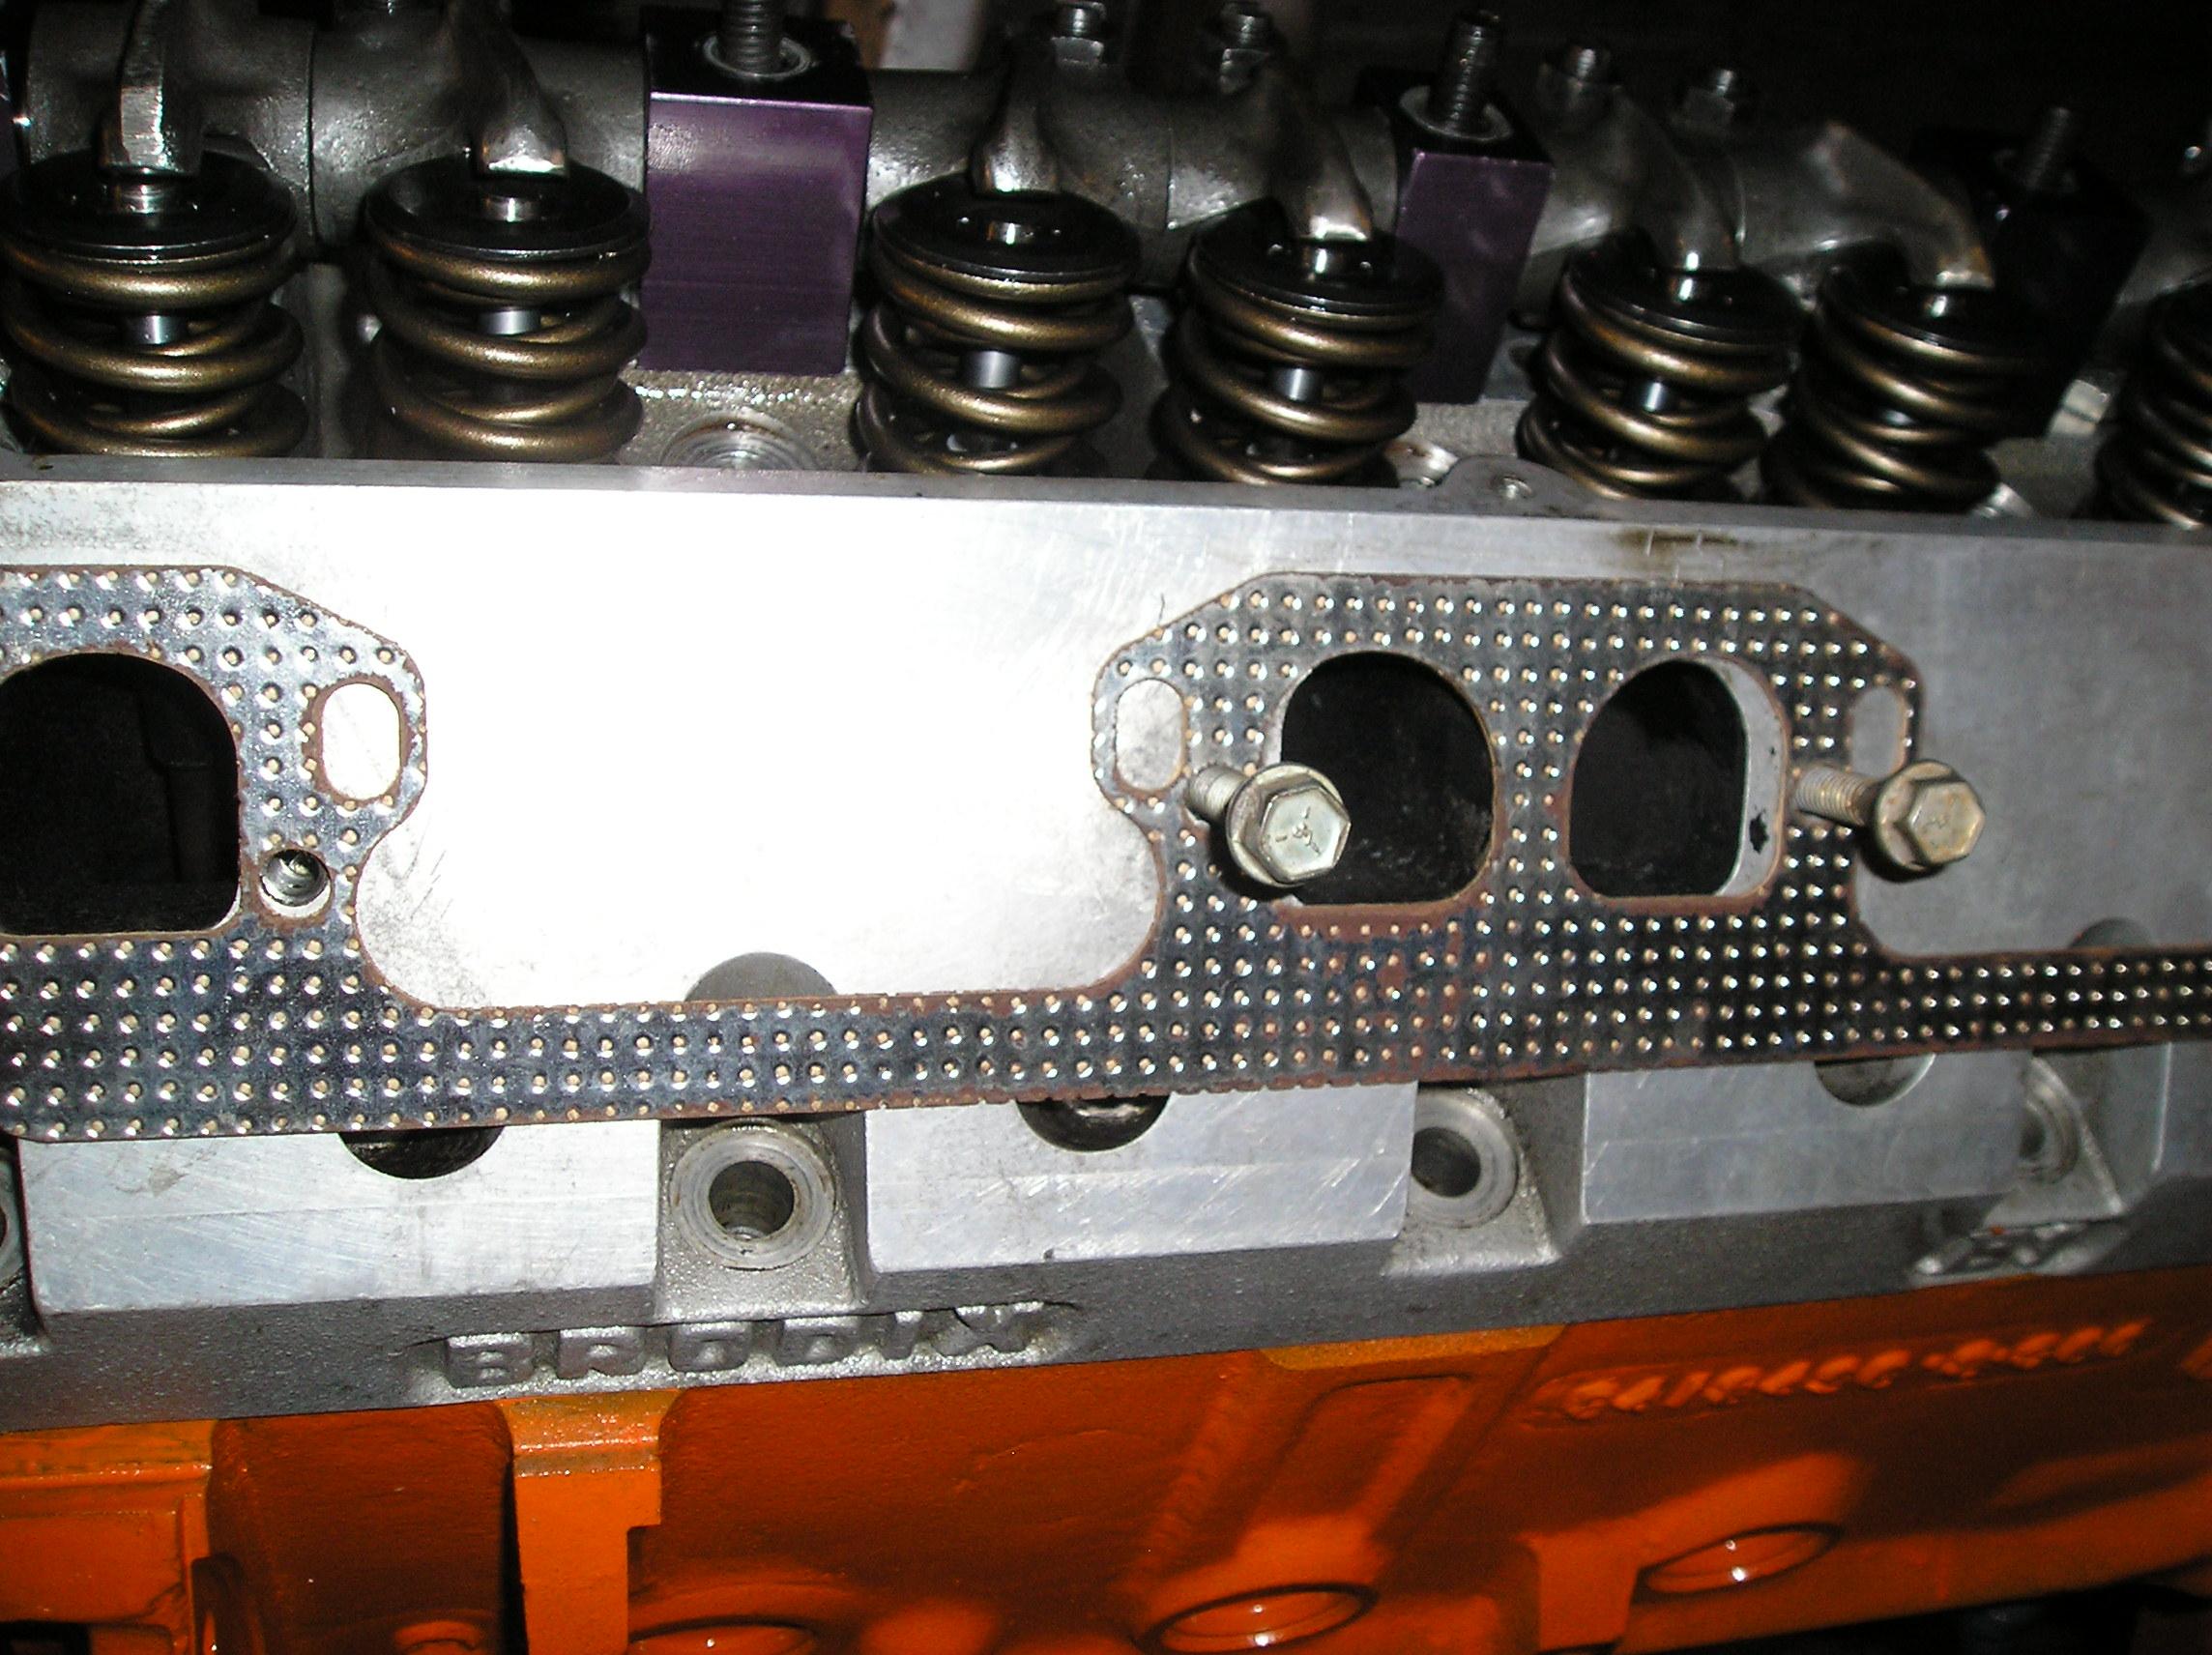 W2 Header Adapters Unlawfls Race Engine Tech Moparts Forums Http Boardmopartsorg Ubbthreads Wiringdiagjpg 7477805 Engine2012001